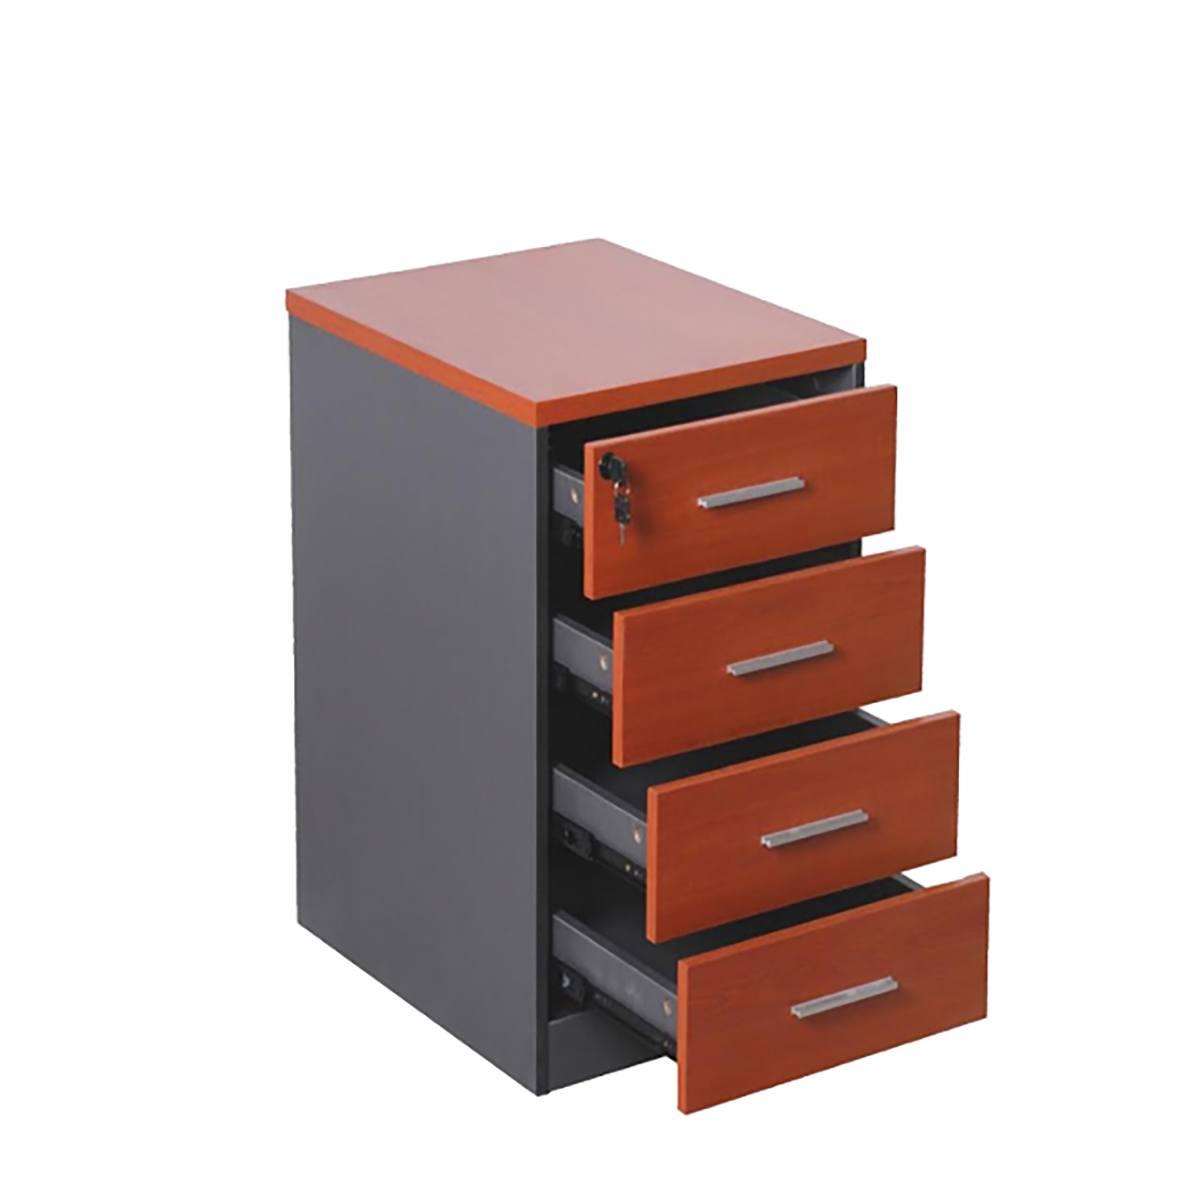 Cajonera 4 cajones muebles de oficina decoprosillas for Cajones para muebles